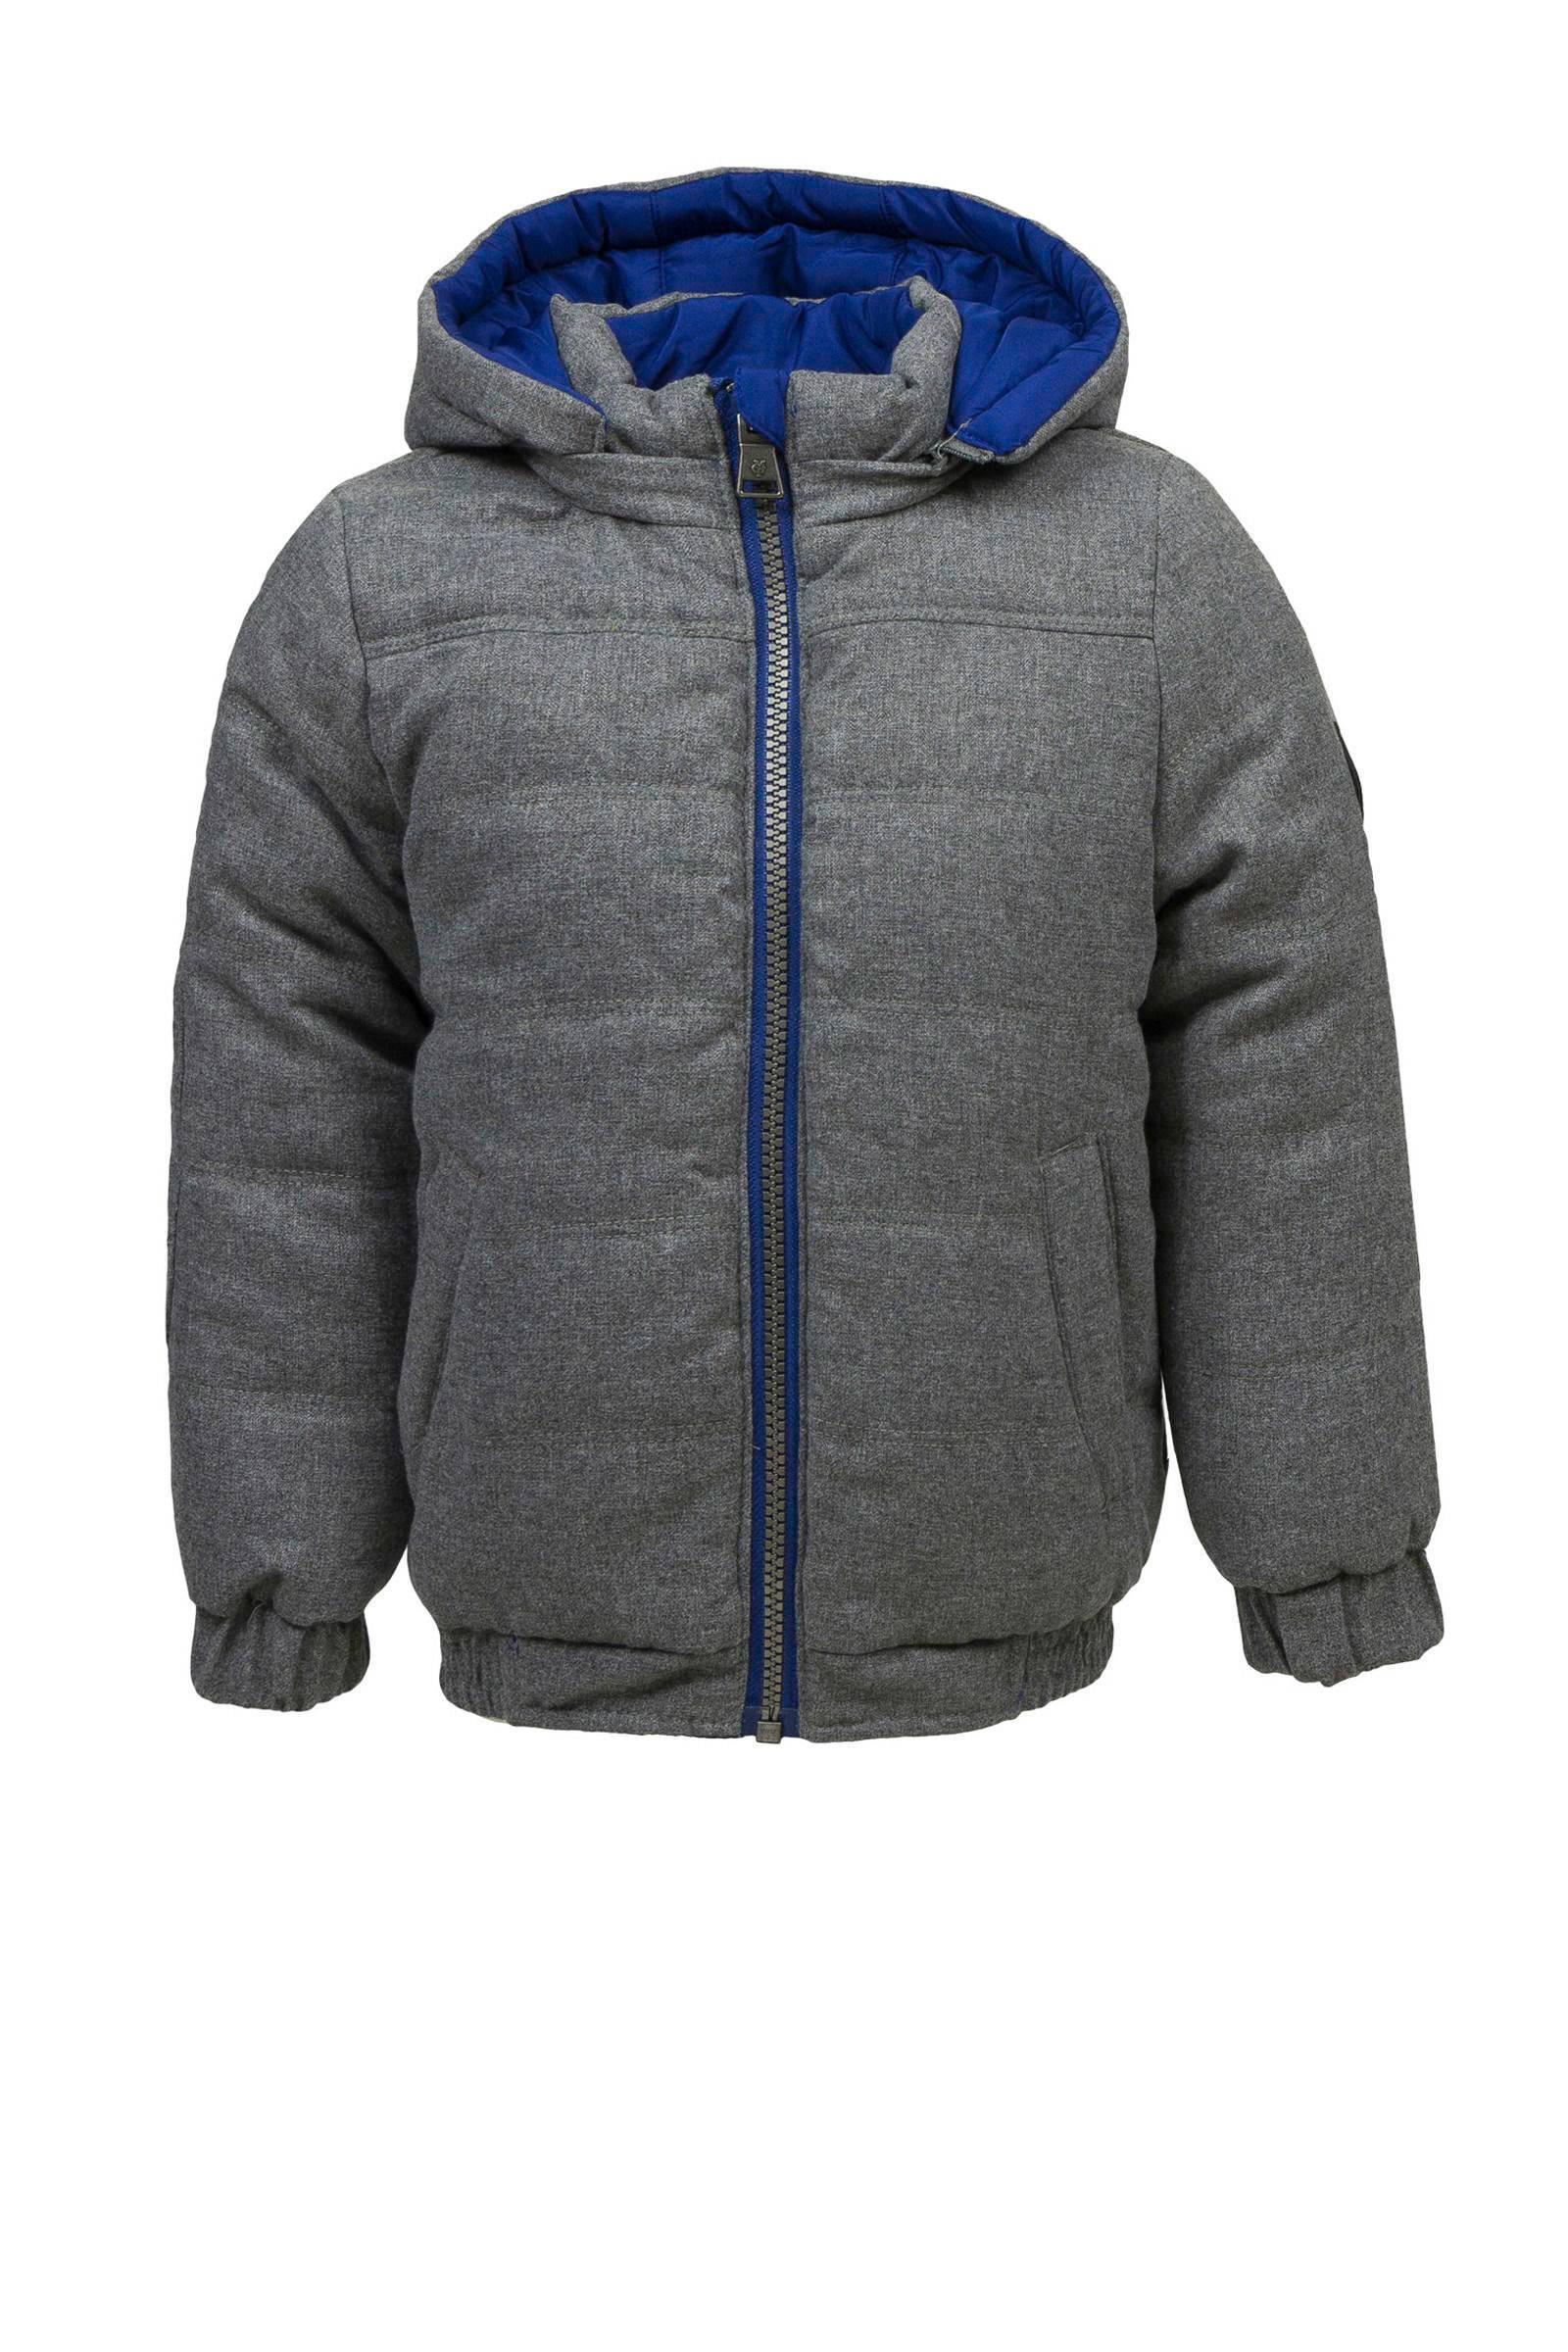 Marc O'Polo omkeerbare winterjas grijs (jongens)